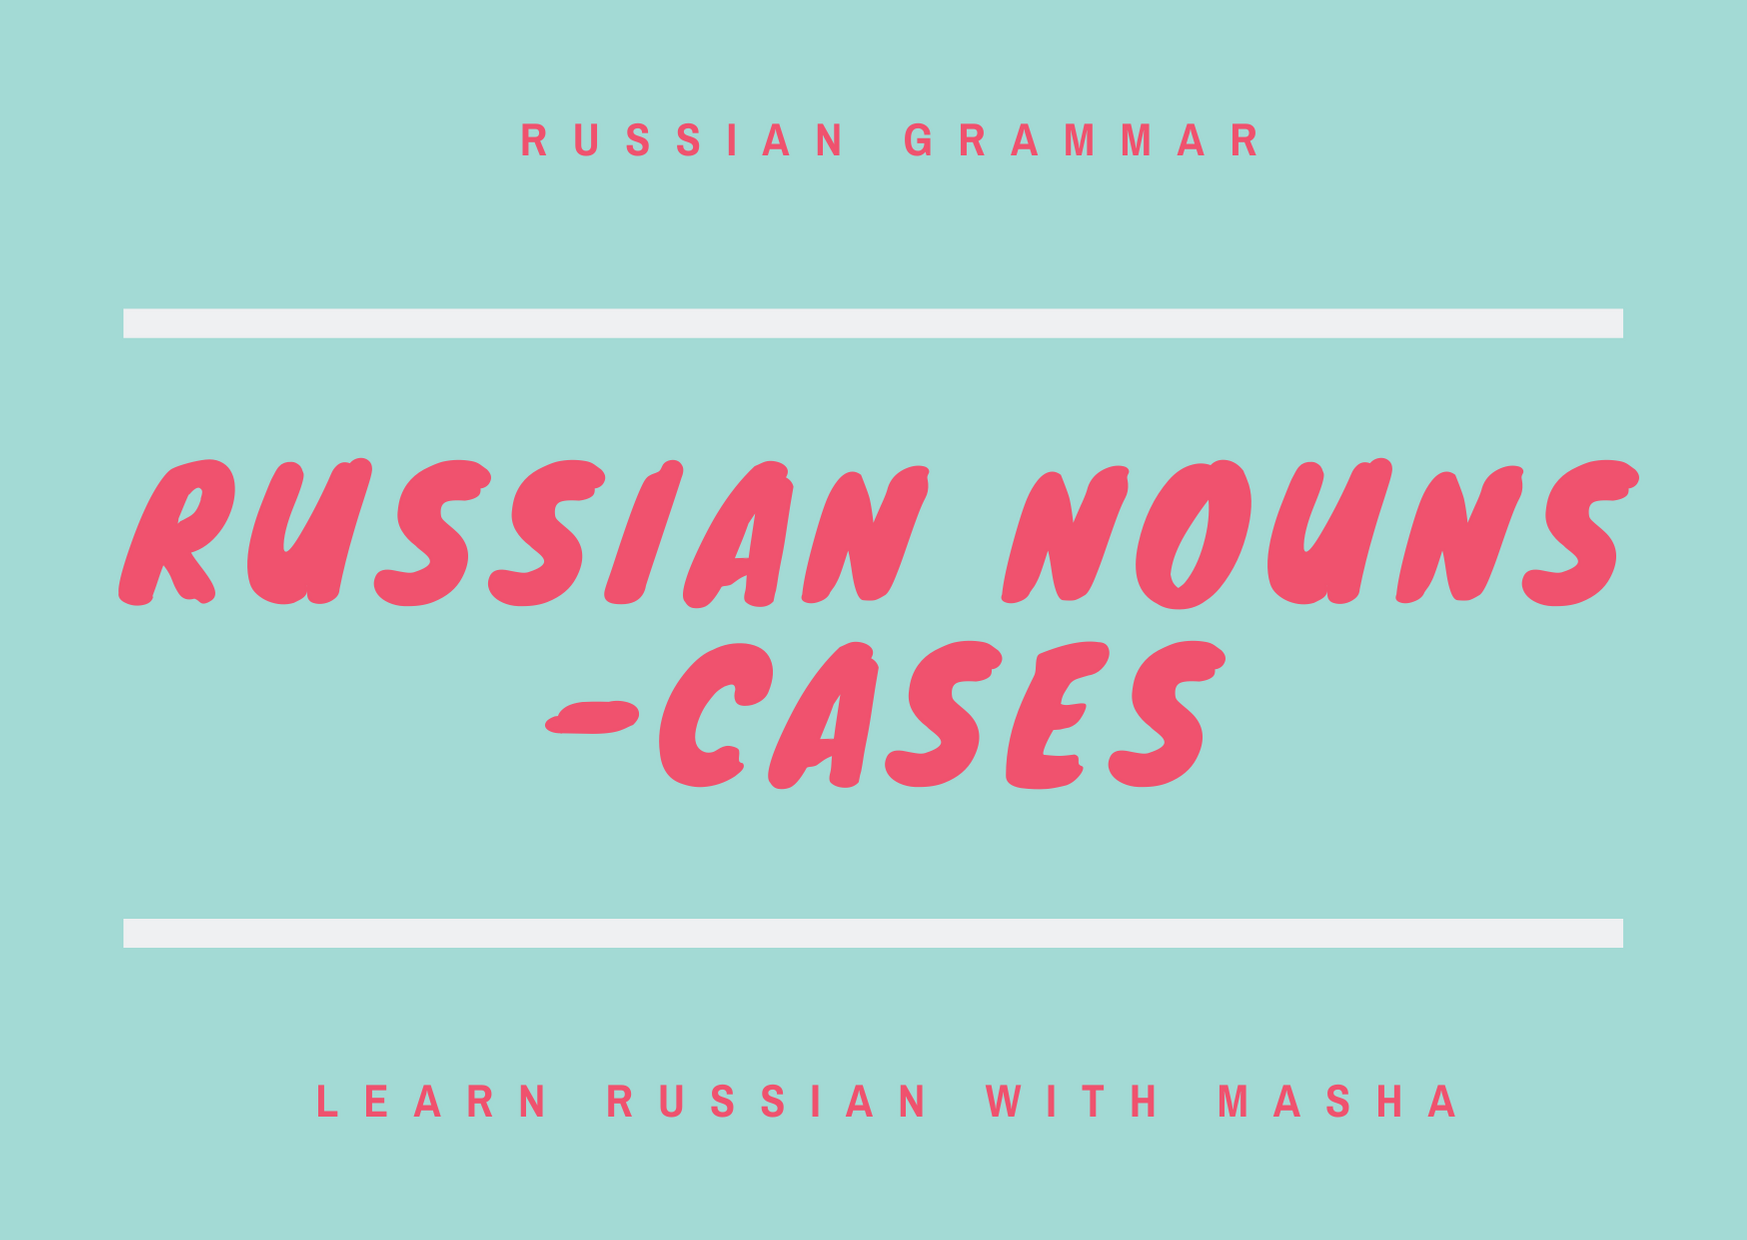 russian nouns cases